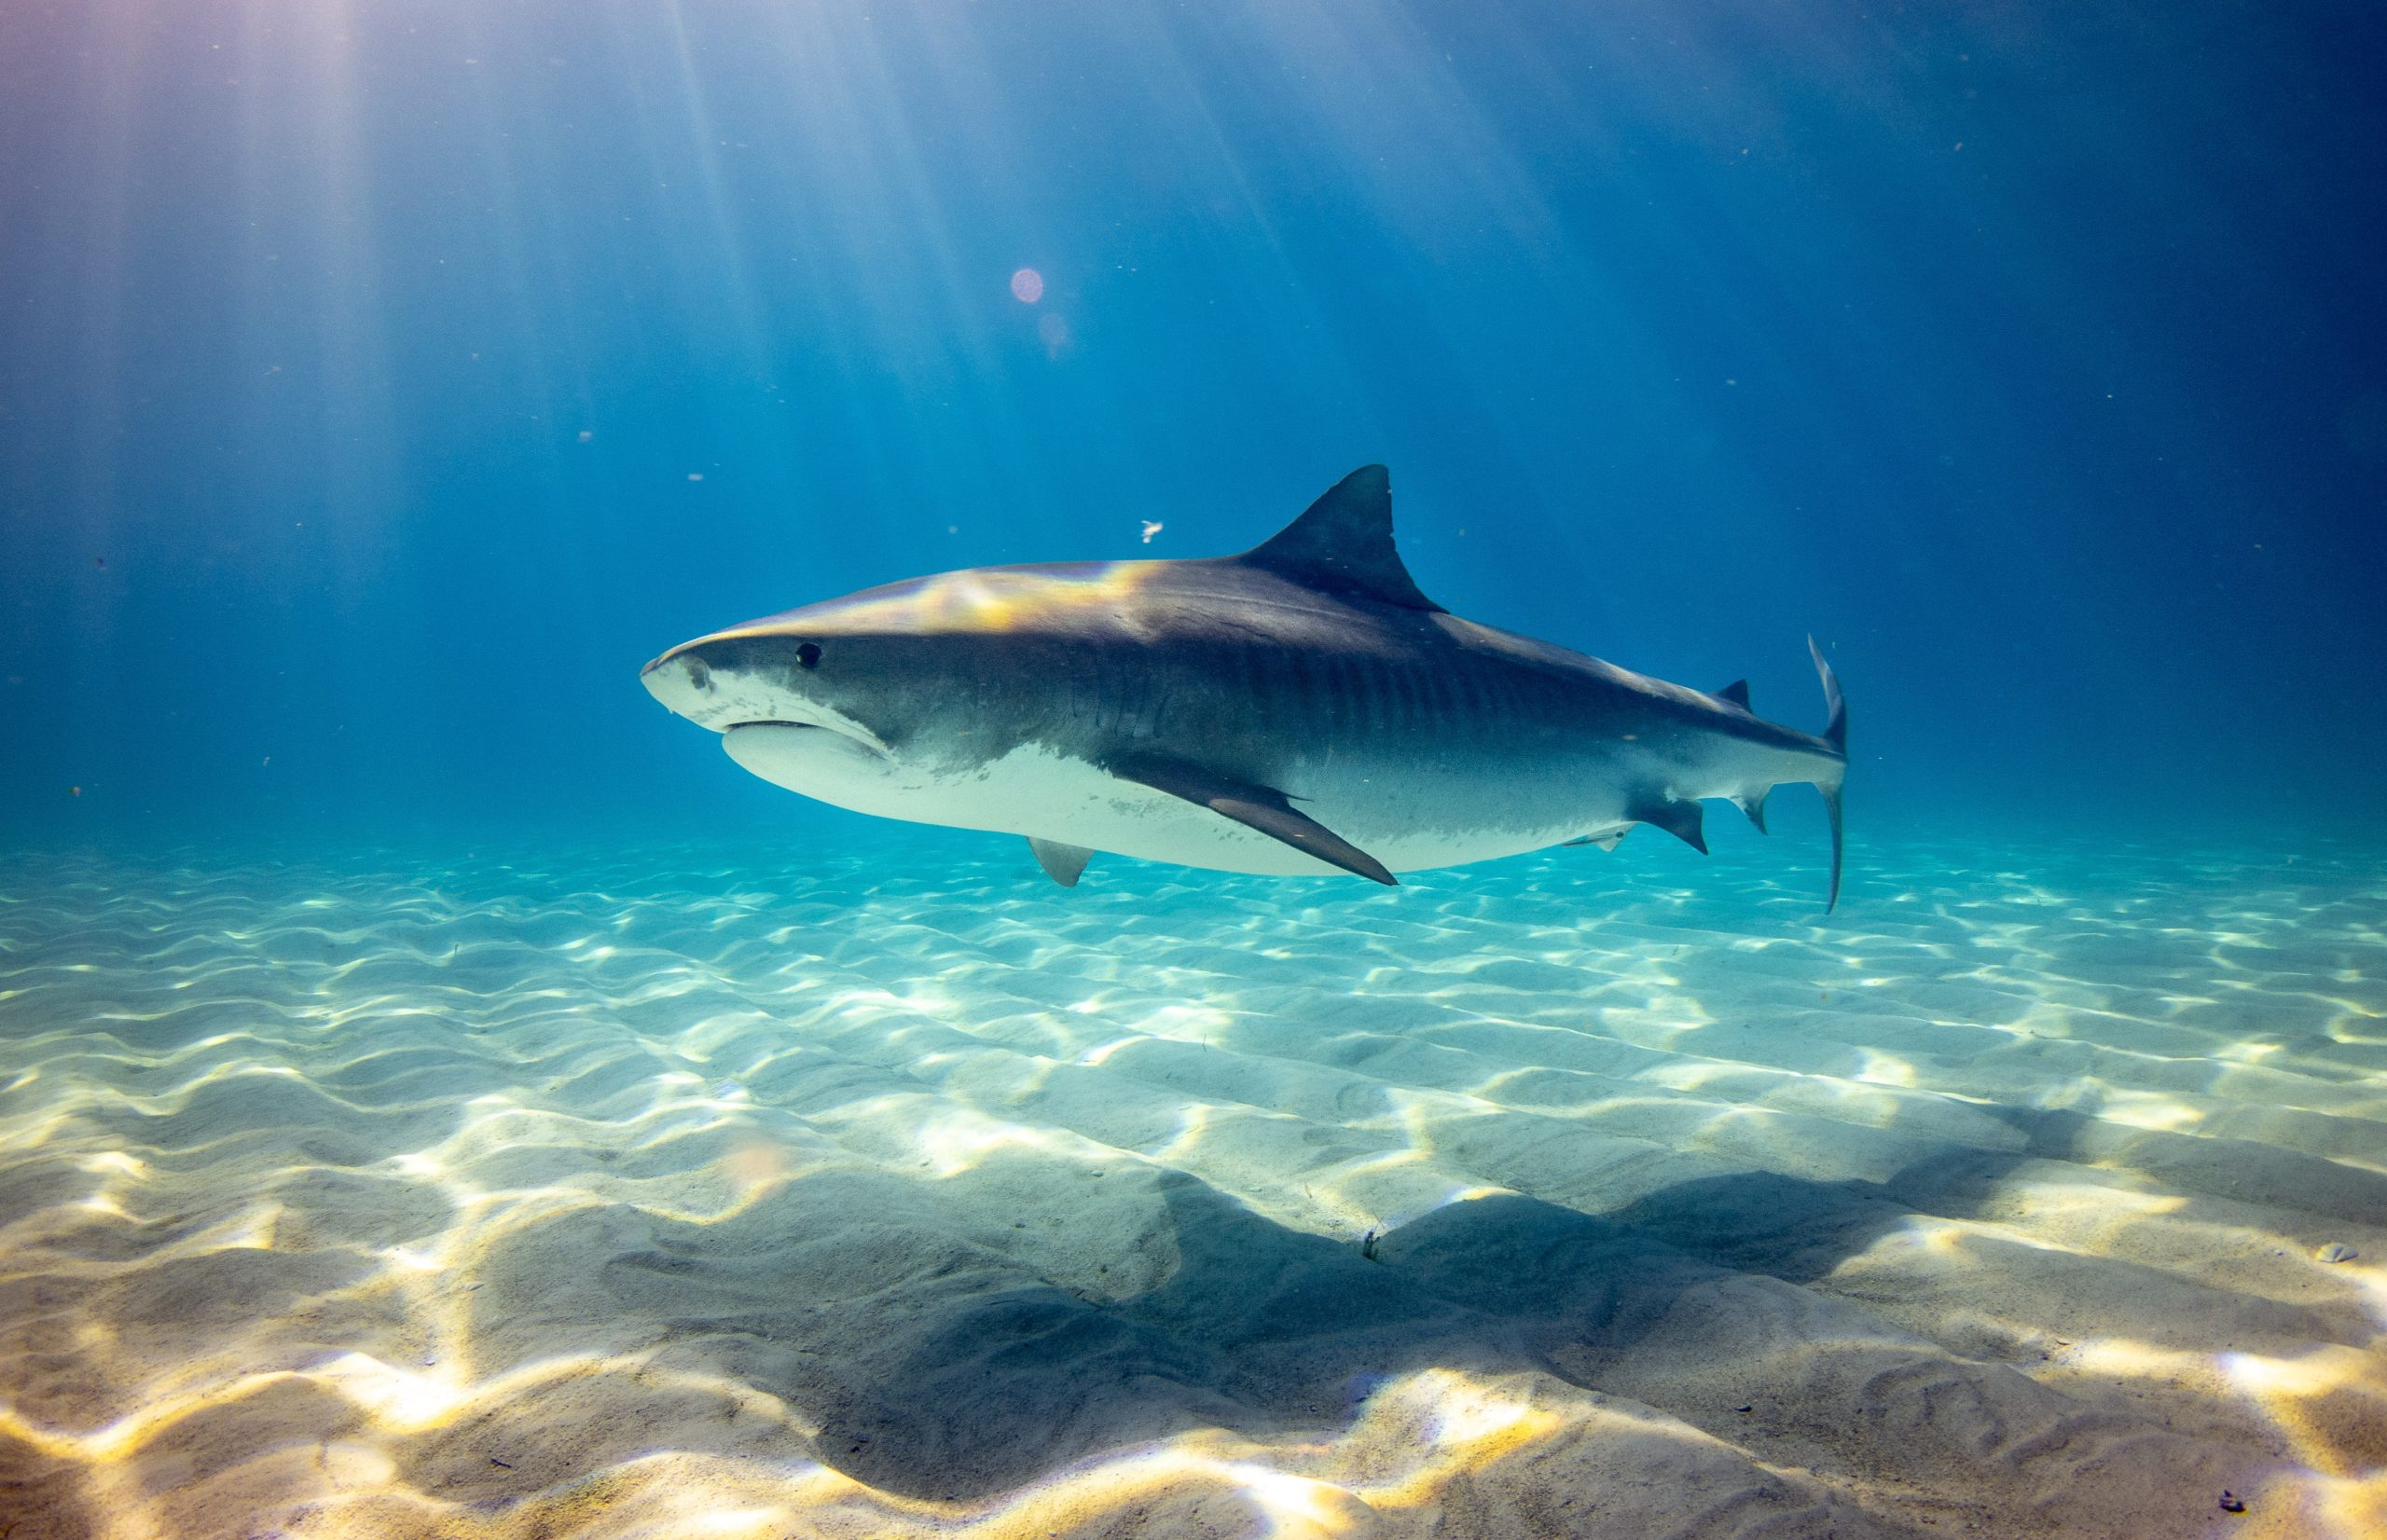 Great white sharks eat more bottom-dwelling fish than